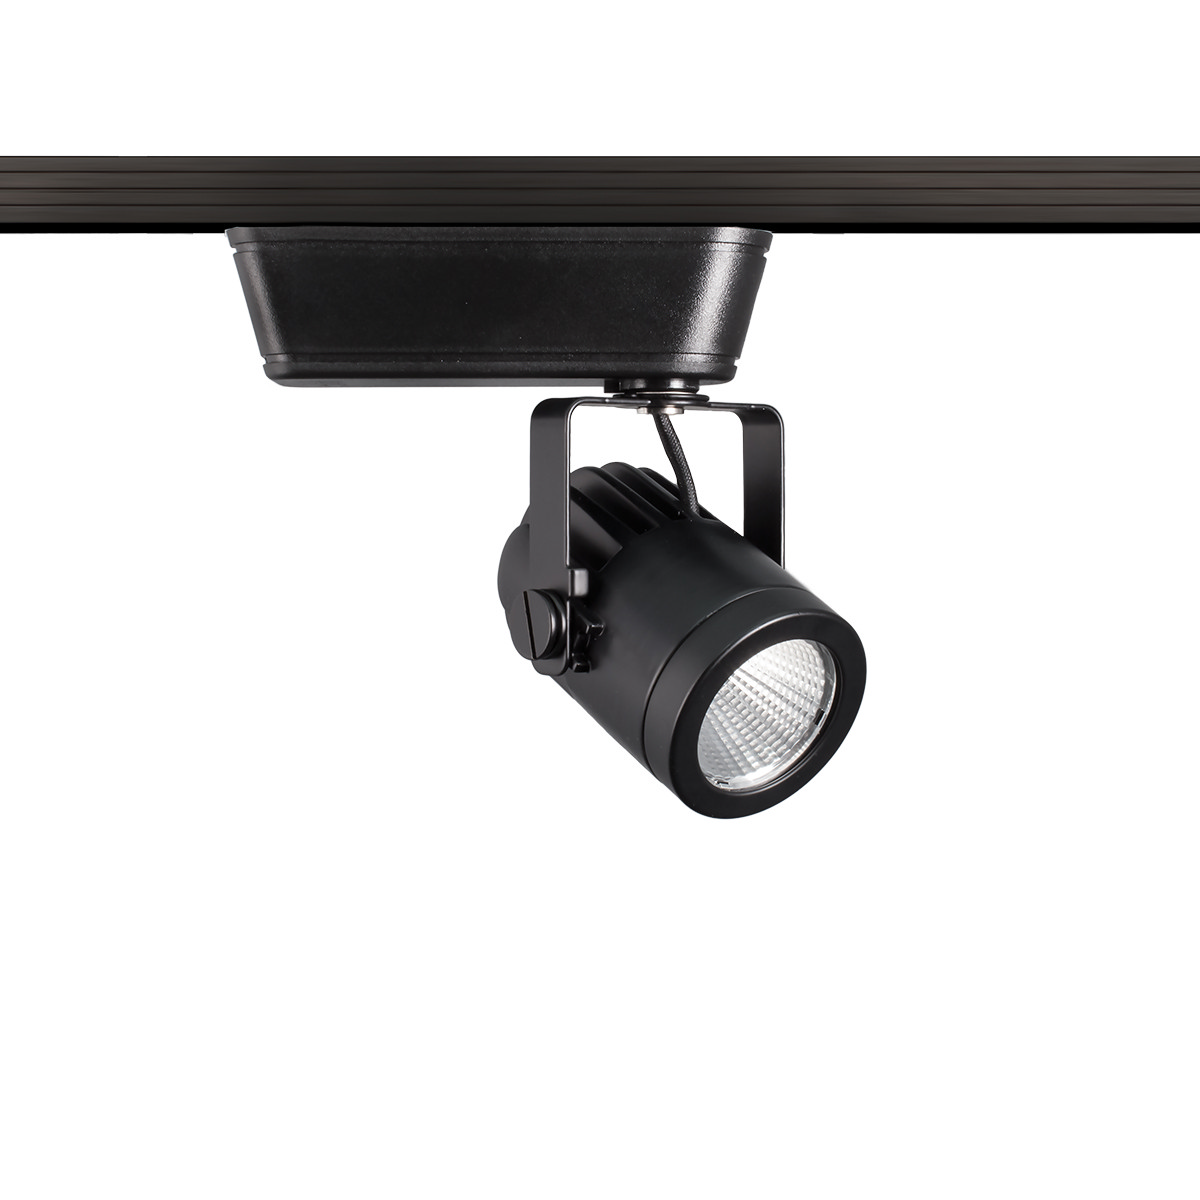 WAC Lighting Precision LED Low Voltage J-Track Head Black 14.5W 4000K Spot Beam Black